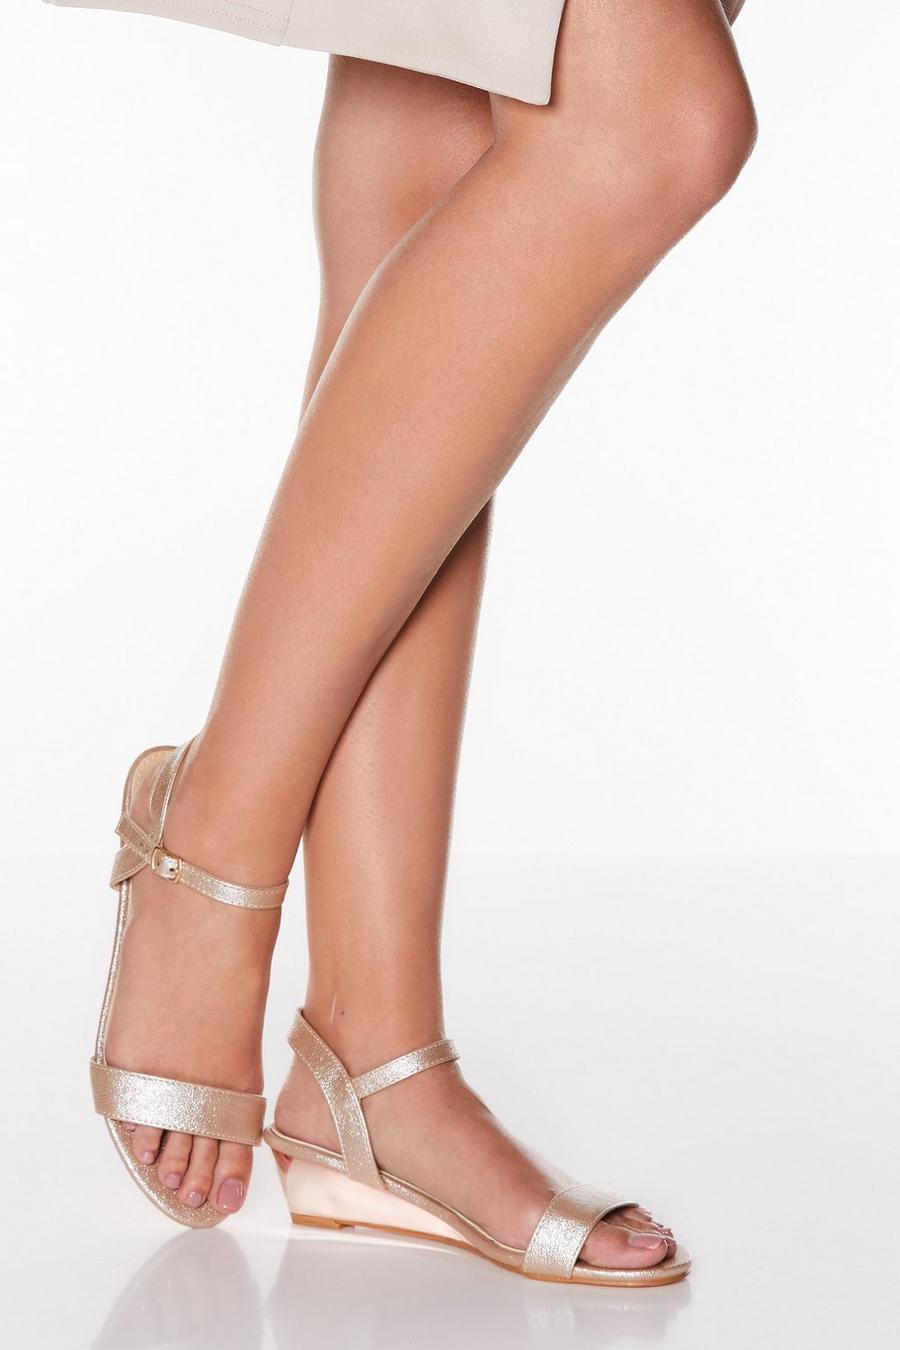 new york the latest luxury aesthetic Rose Gold Metallic Low Heel Wedges